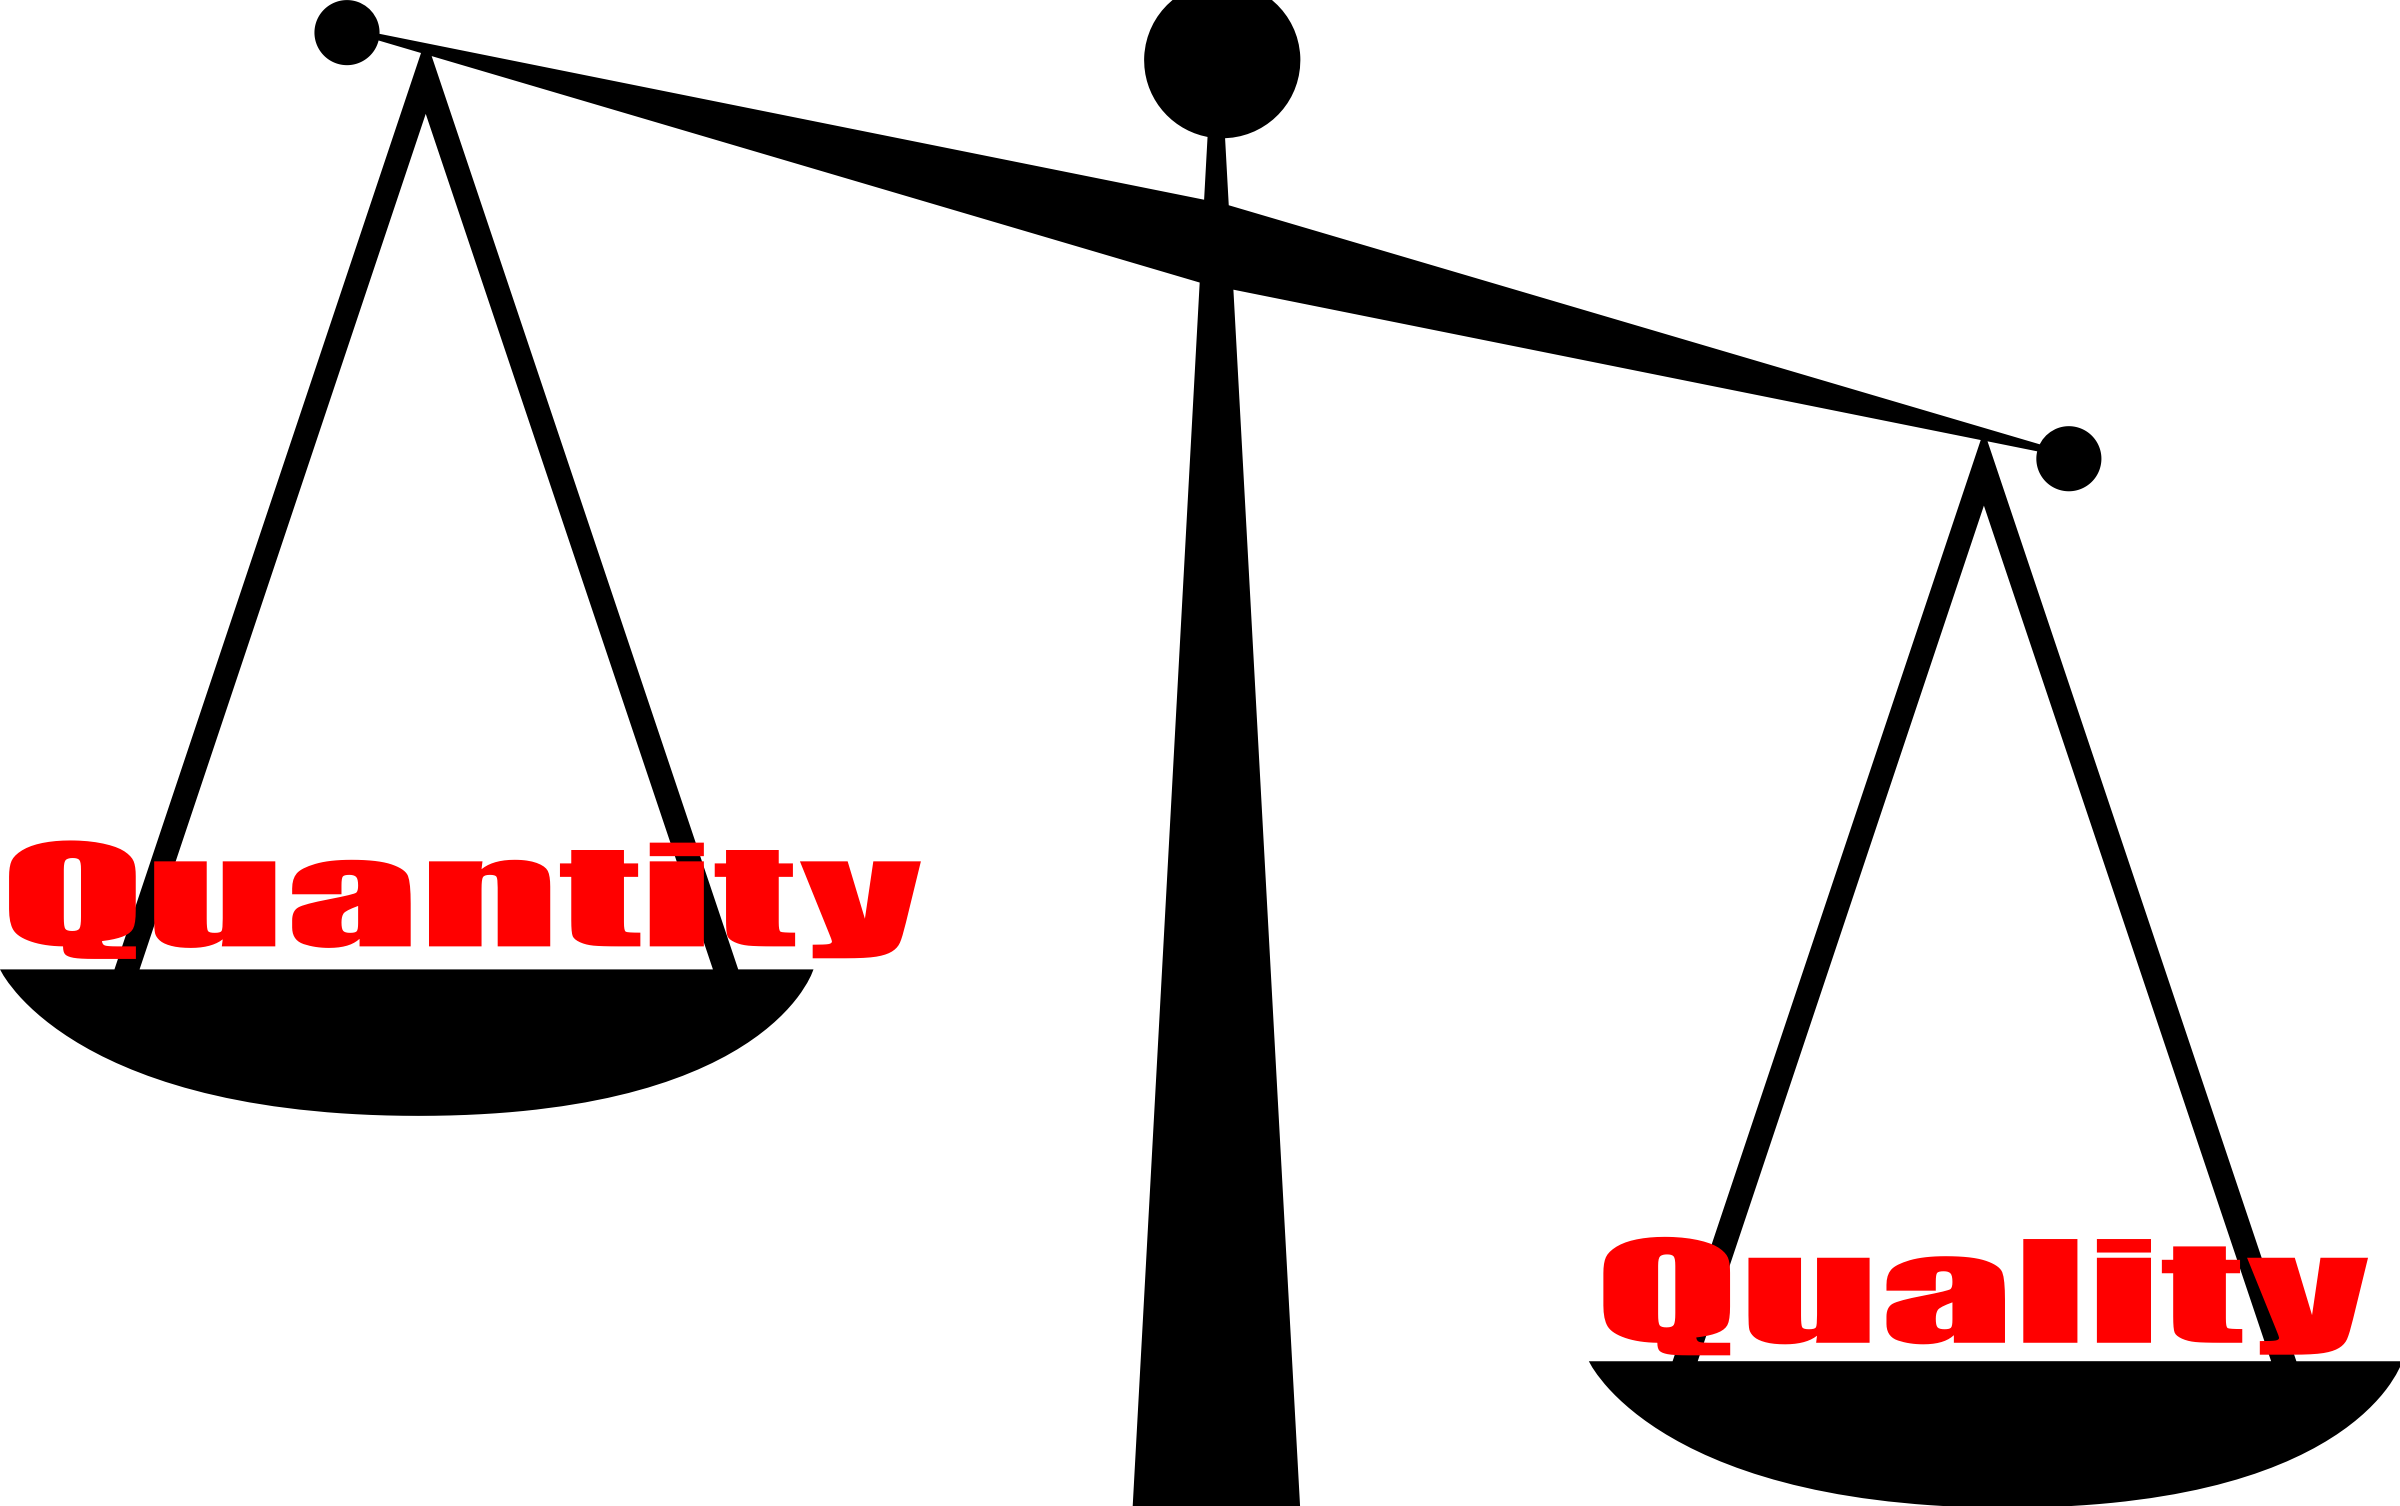 Quality vs quantity.